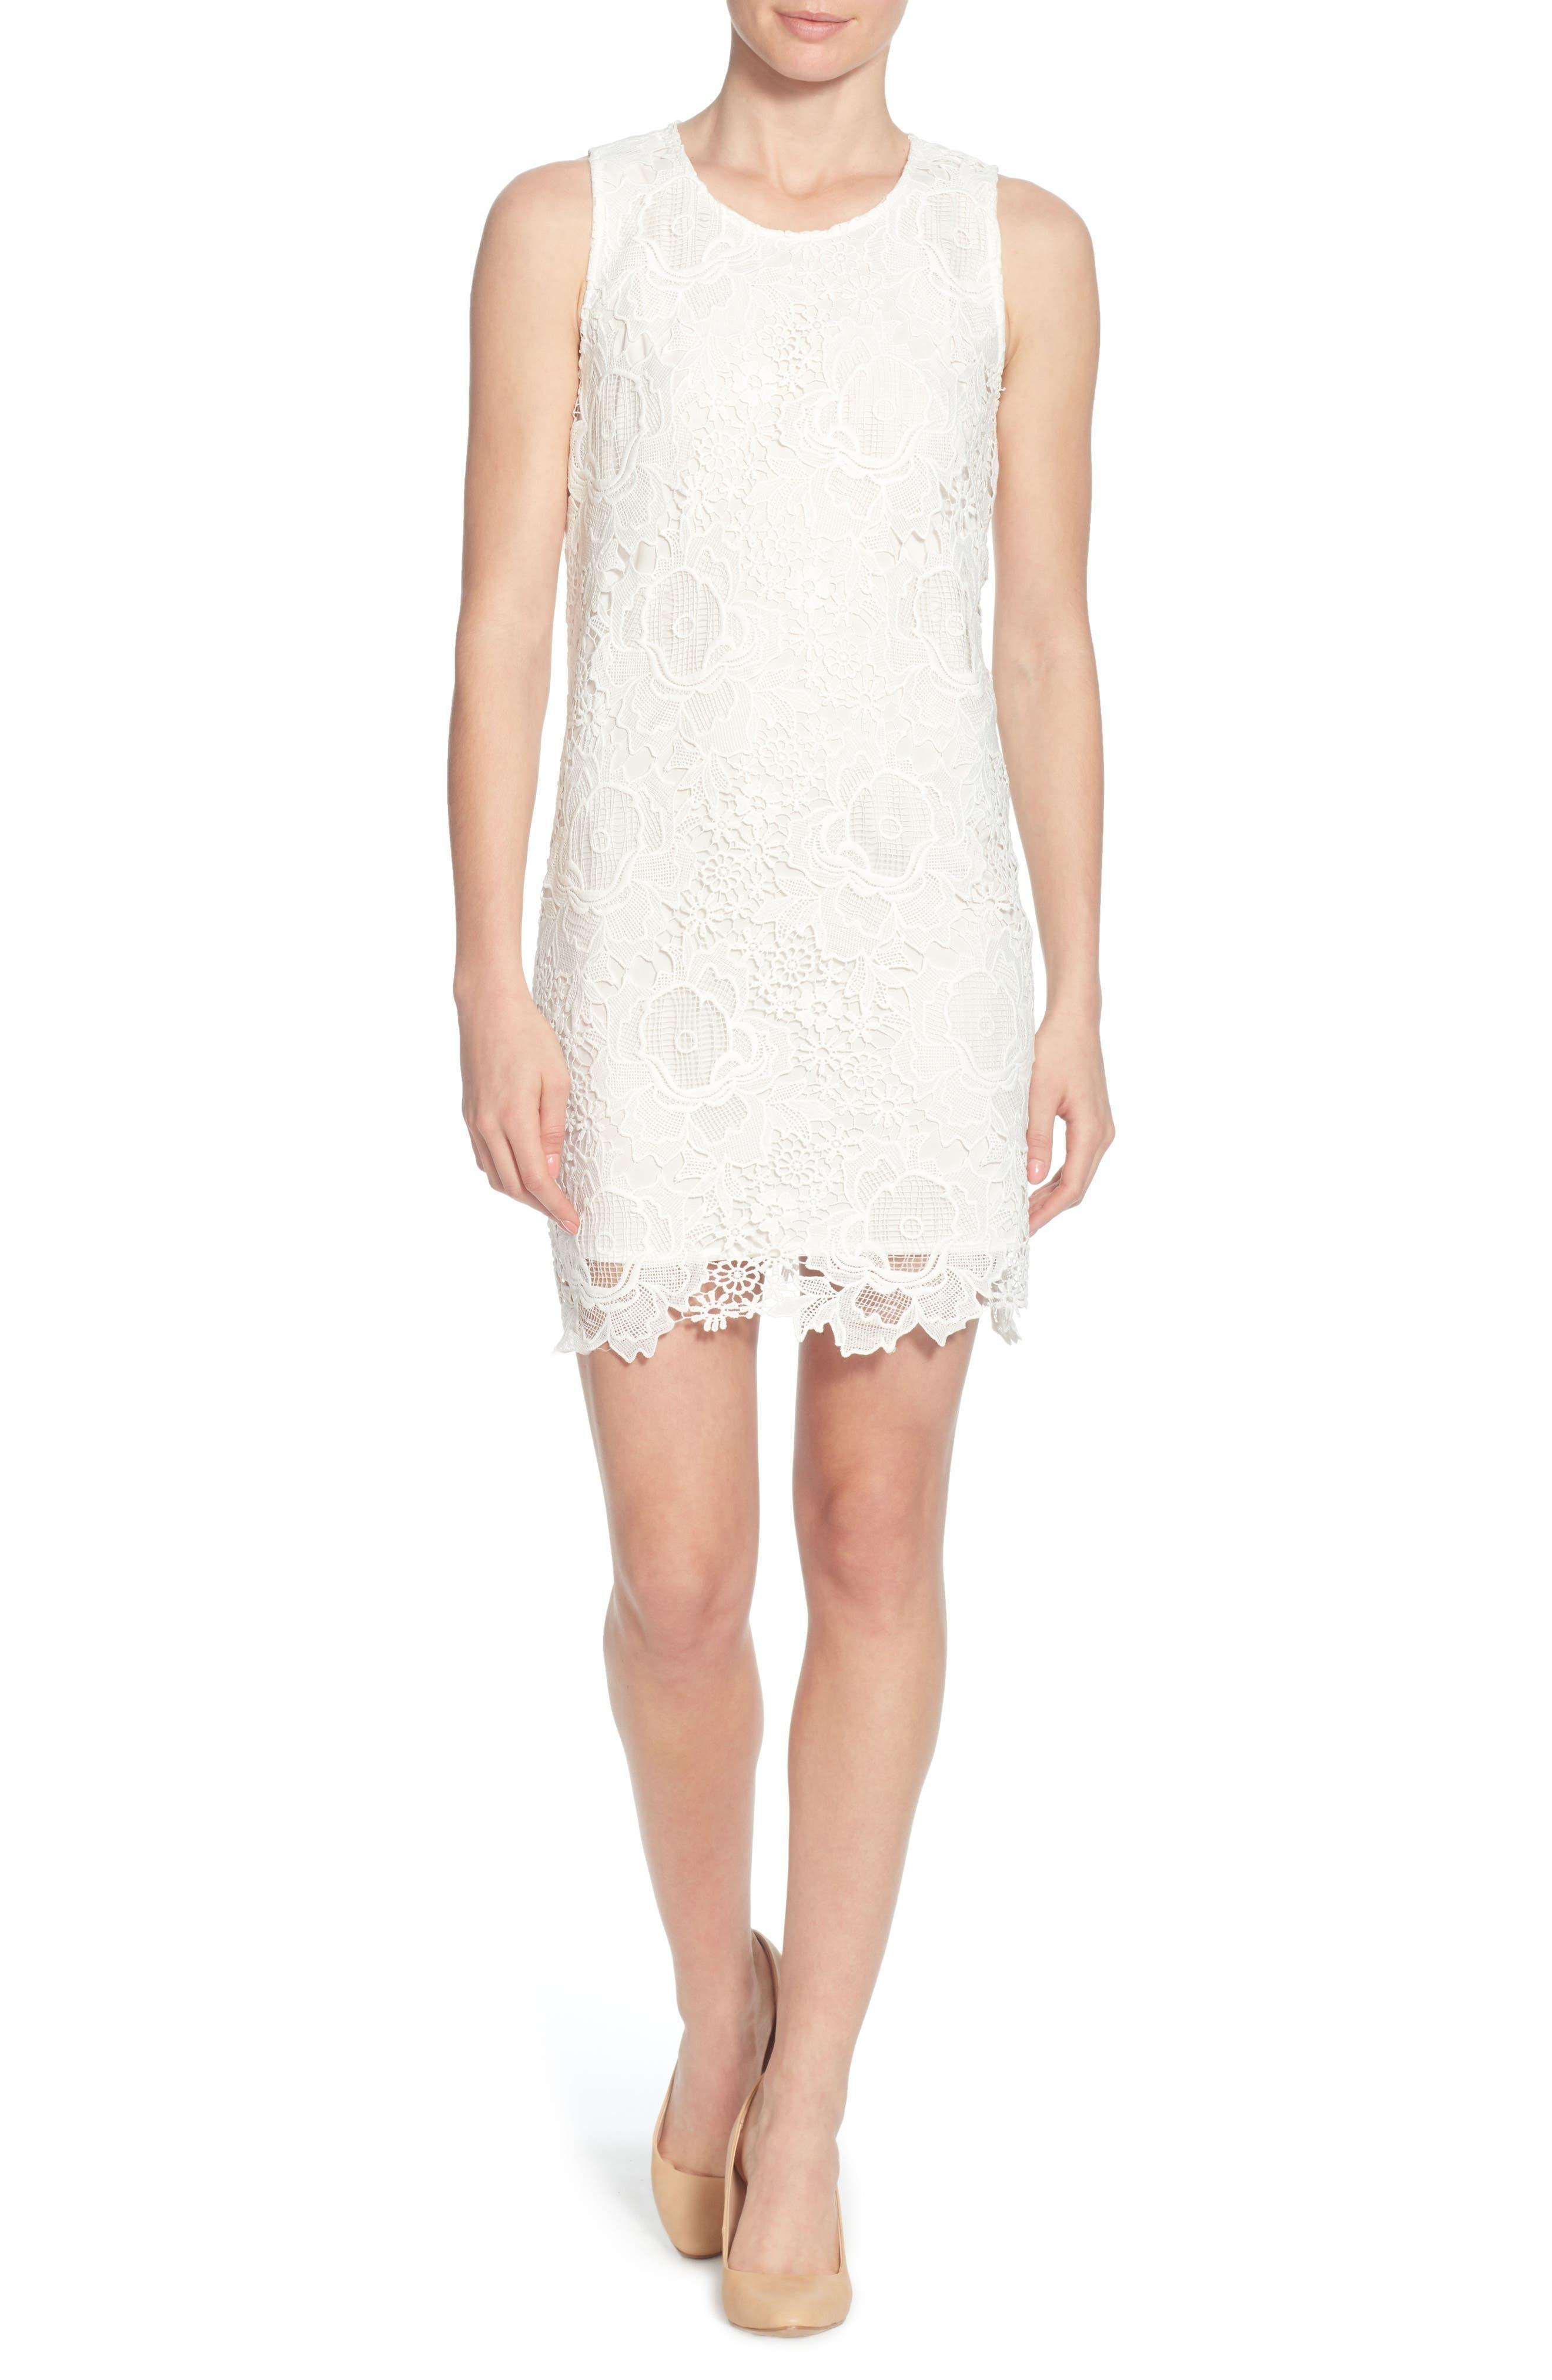 Sherrell Lace Sheath Dress,                             Main thumbnail 1, color,                             165